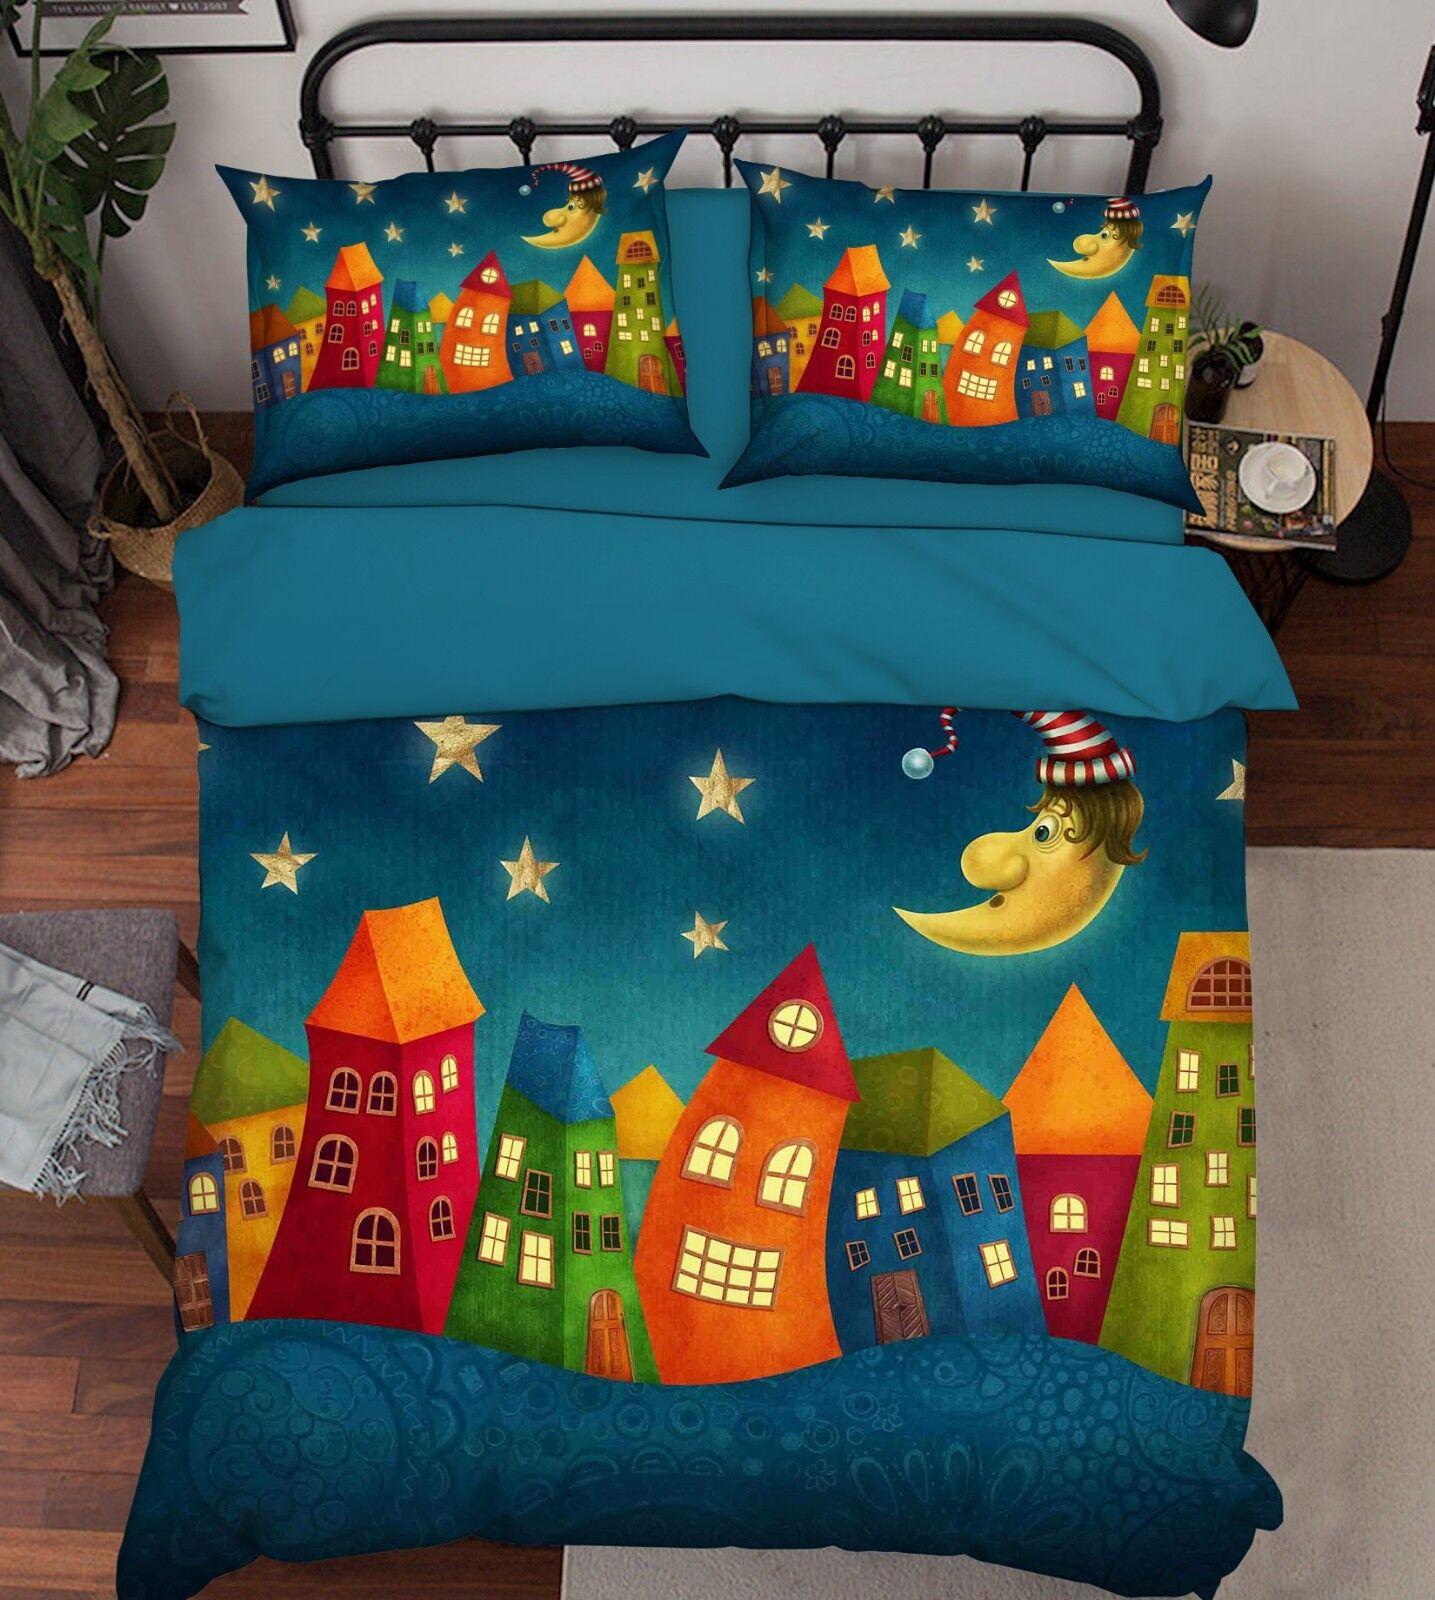 3D Cartoon Houses 79 Bed Pillowcases Quilt Duvet Cover Set Single Queen King CA